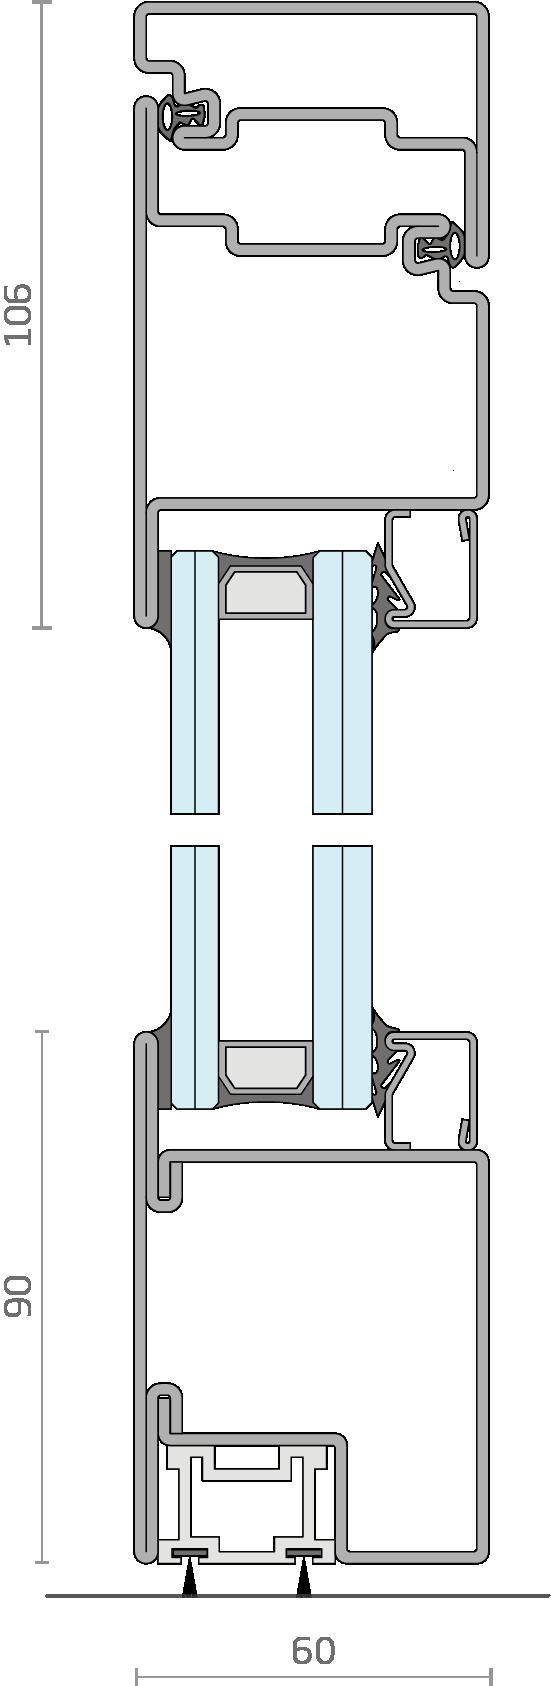 SA 20_P-AE v